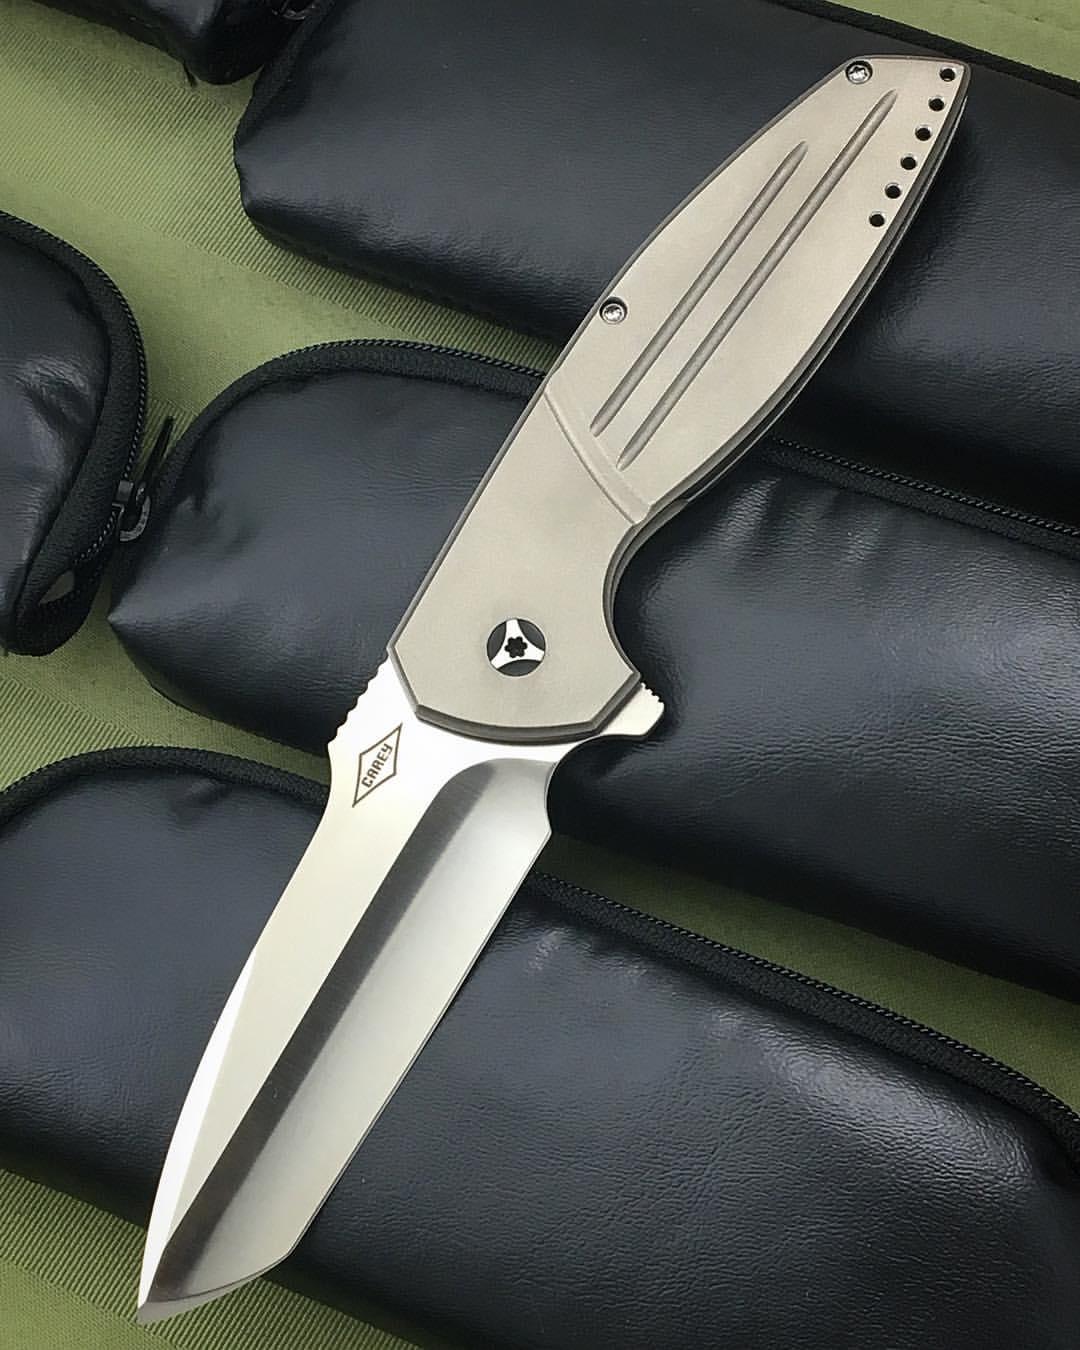 Cayman V2 frame lock grooves